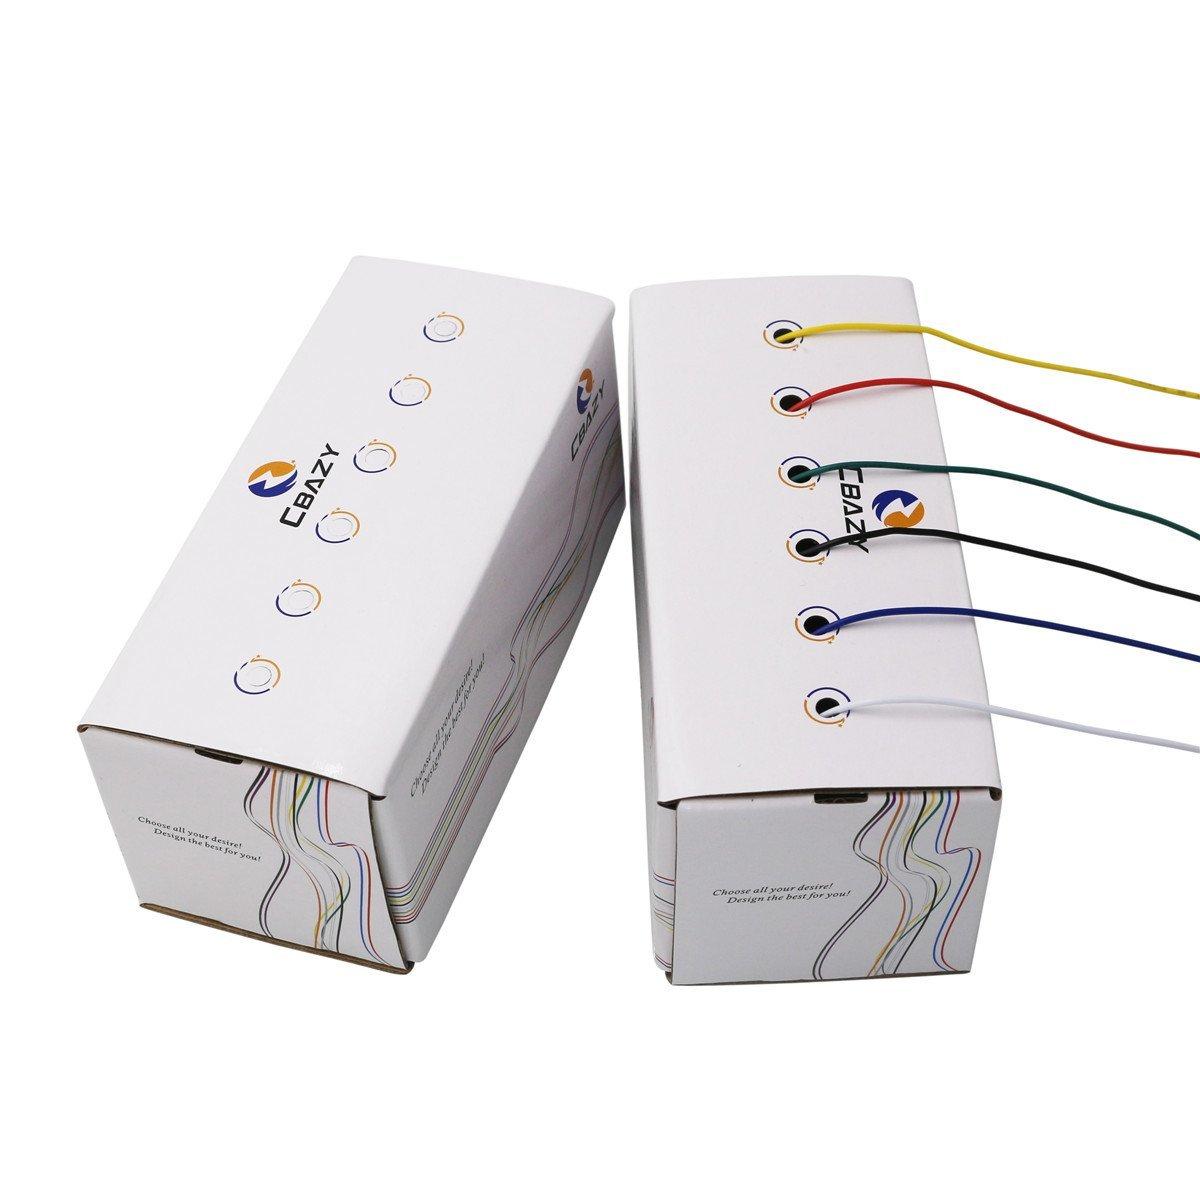 CBAZ Hook up Wire Kit (Stranded Wire Kit) 24 Gauge 6 colors 32.8 ...